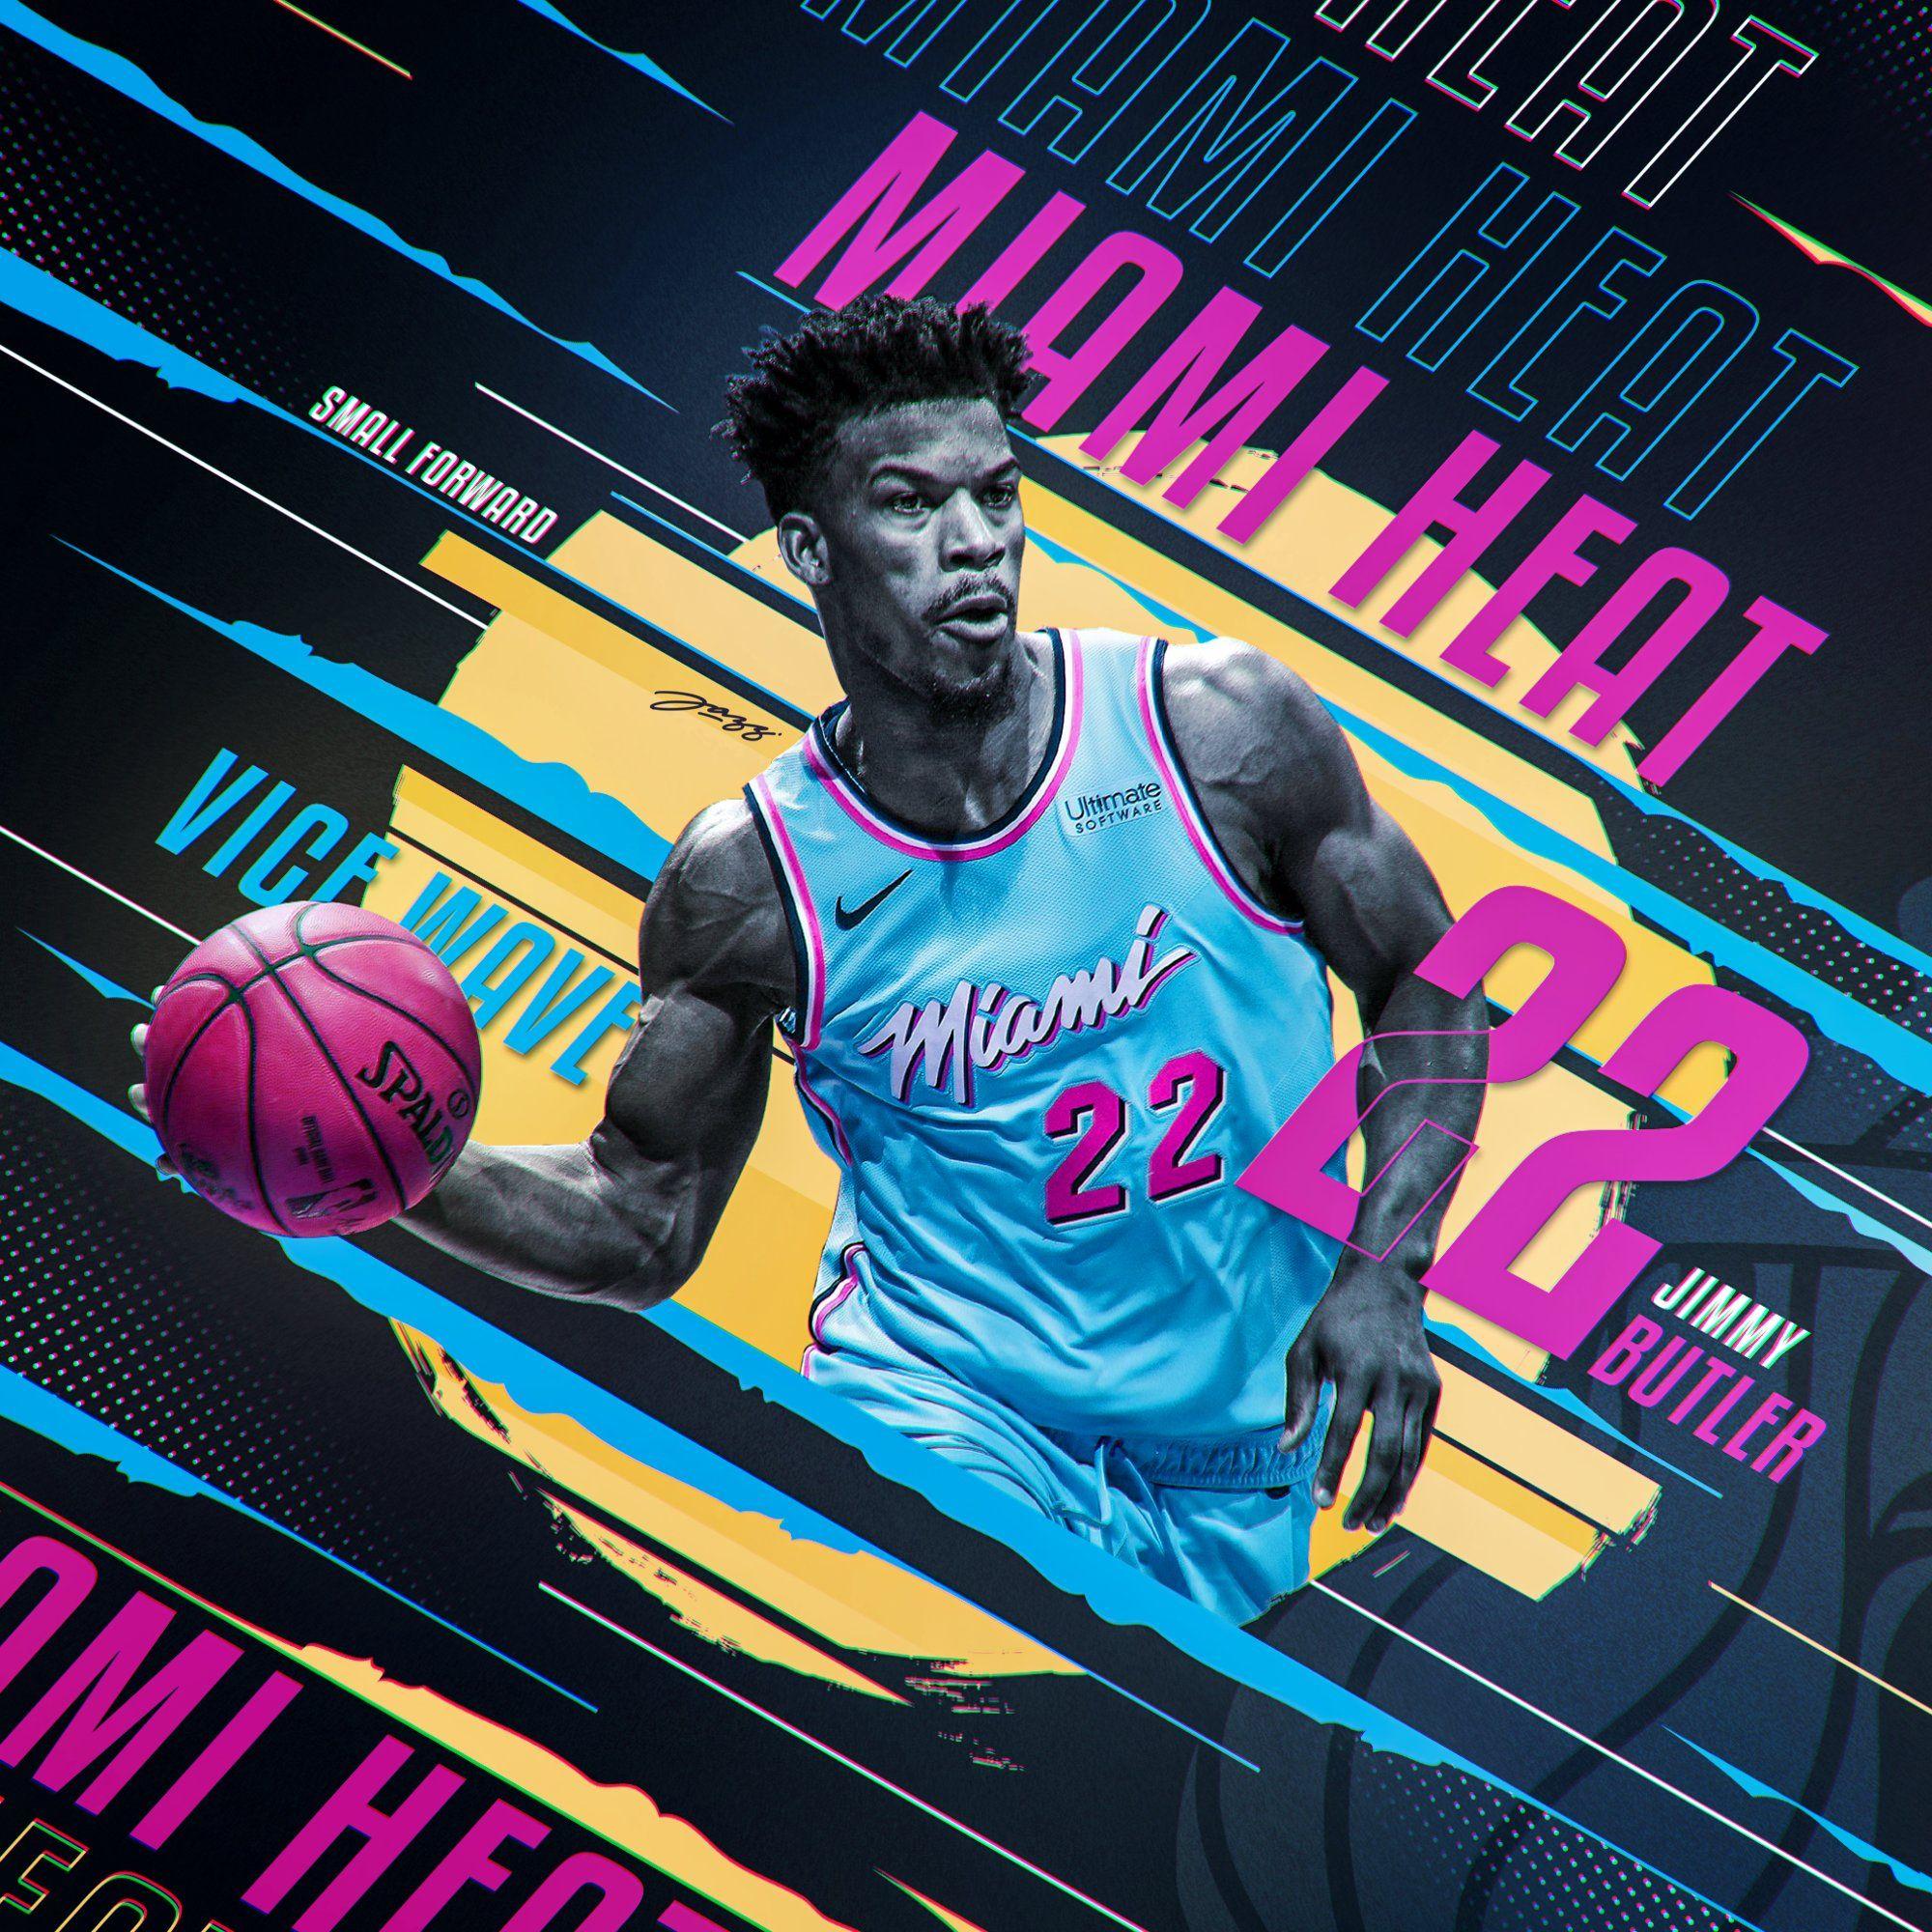 Juke On Deportes Photoshop Disenos Creativos